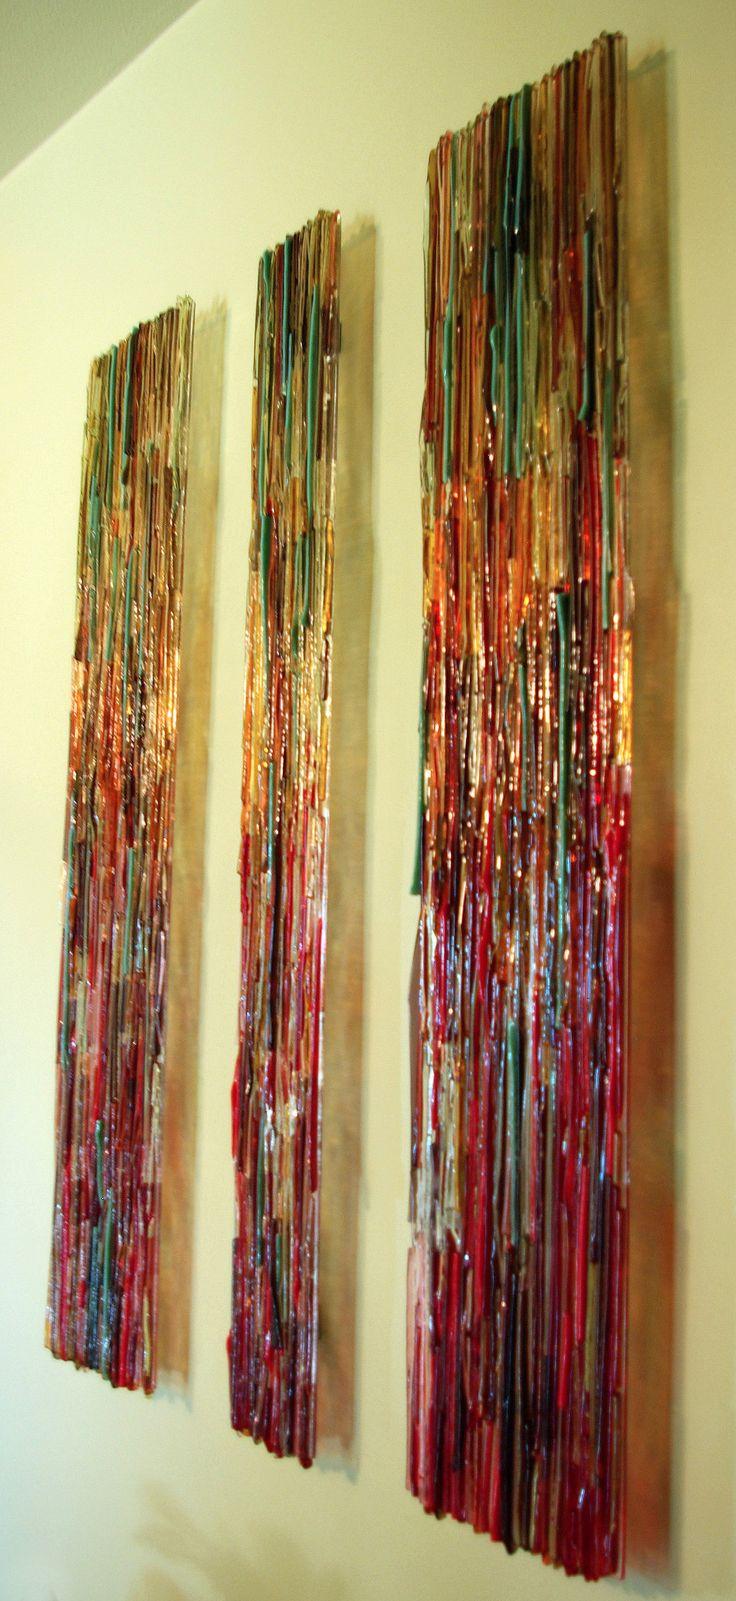 best glass wall art ideas on pinterest  glass art fused  - transpire wall panels sarinda jones art glass wall art  artful home